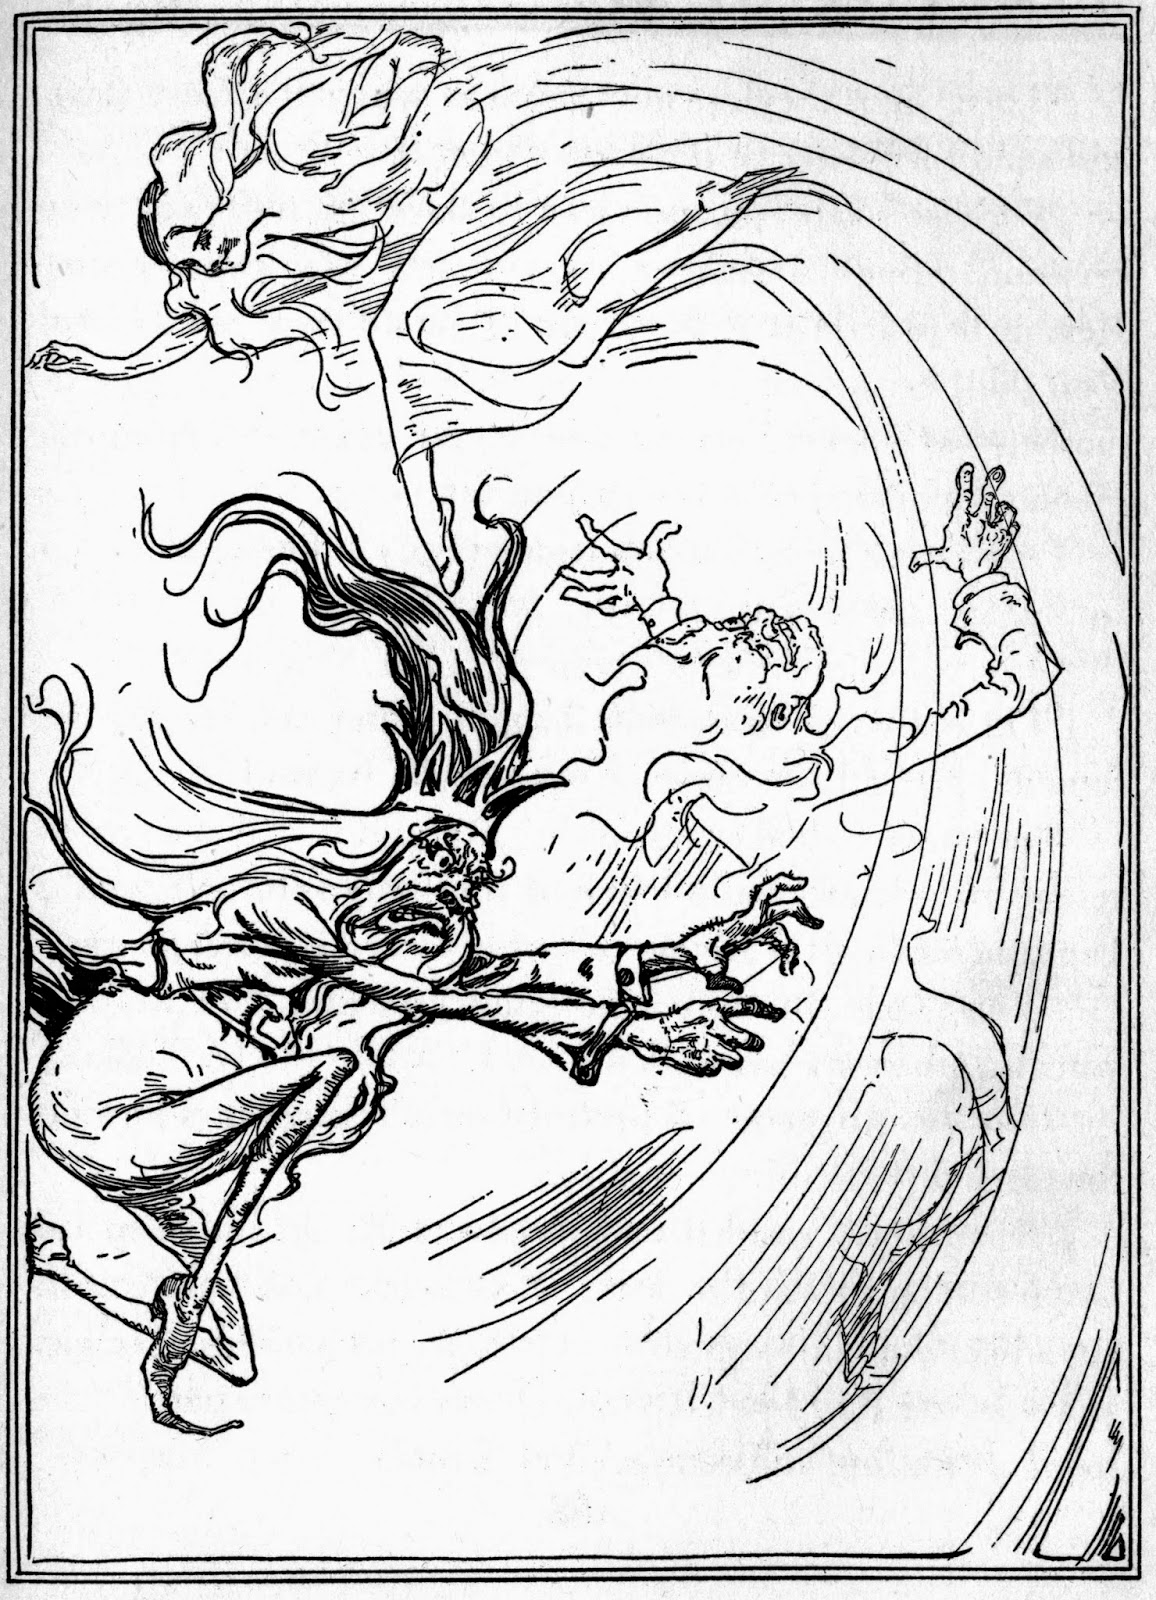 tiktok coloring pages | The Tik-Tok Man of Oz: GALLERY